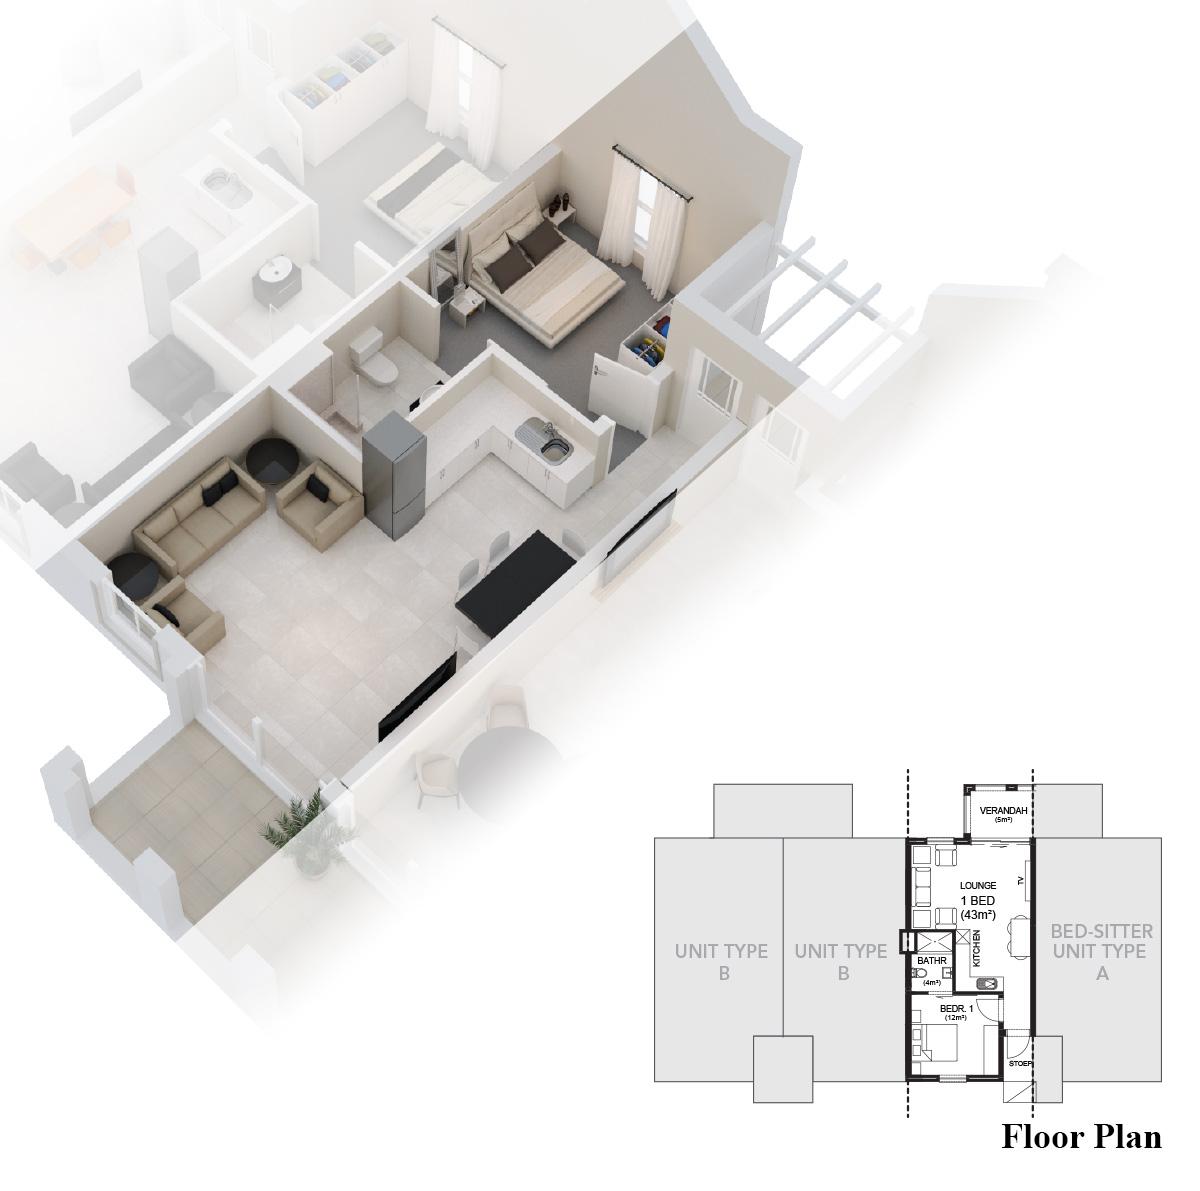 zevenwacht_lifestyle_estate_retirement_apartments_type-b_1200x1191